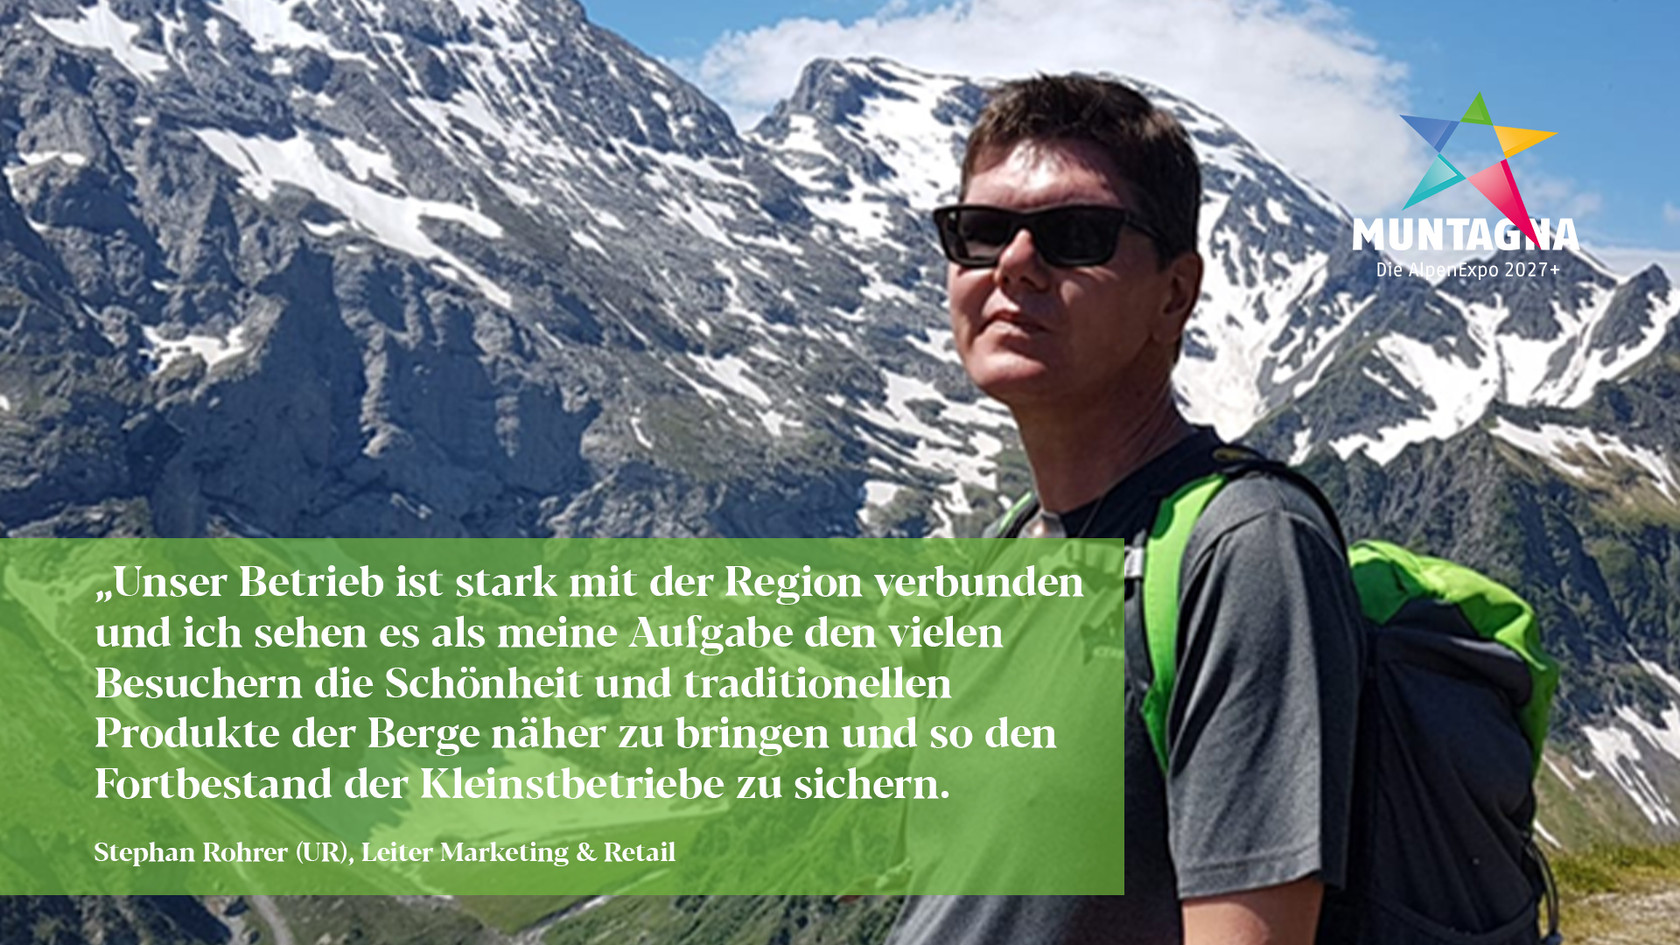 20200707_Testimonial_Stephan_Rohrer_web.